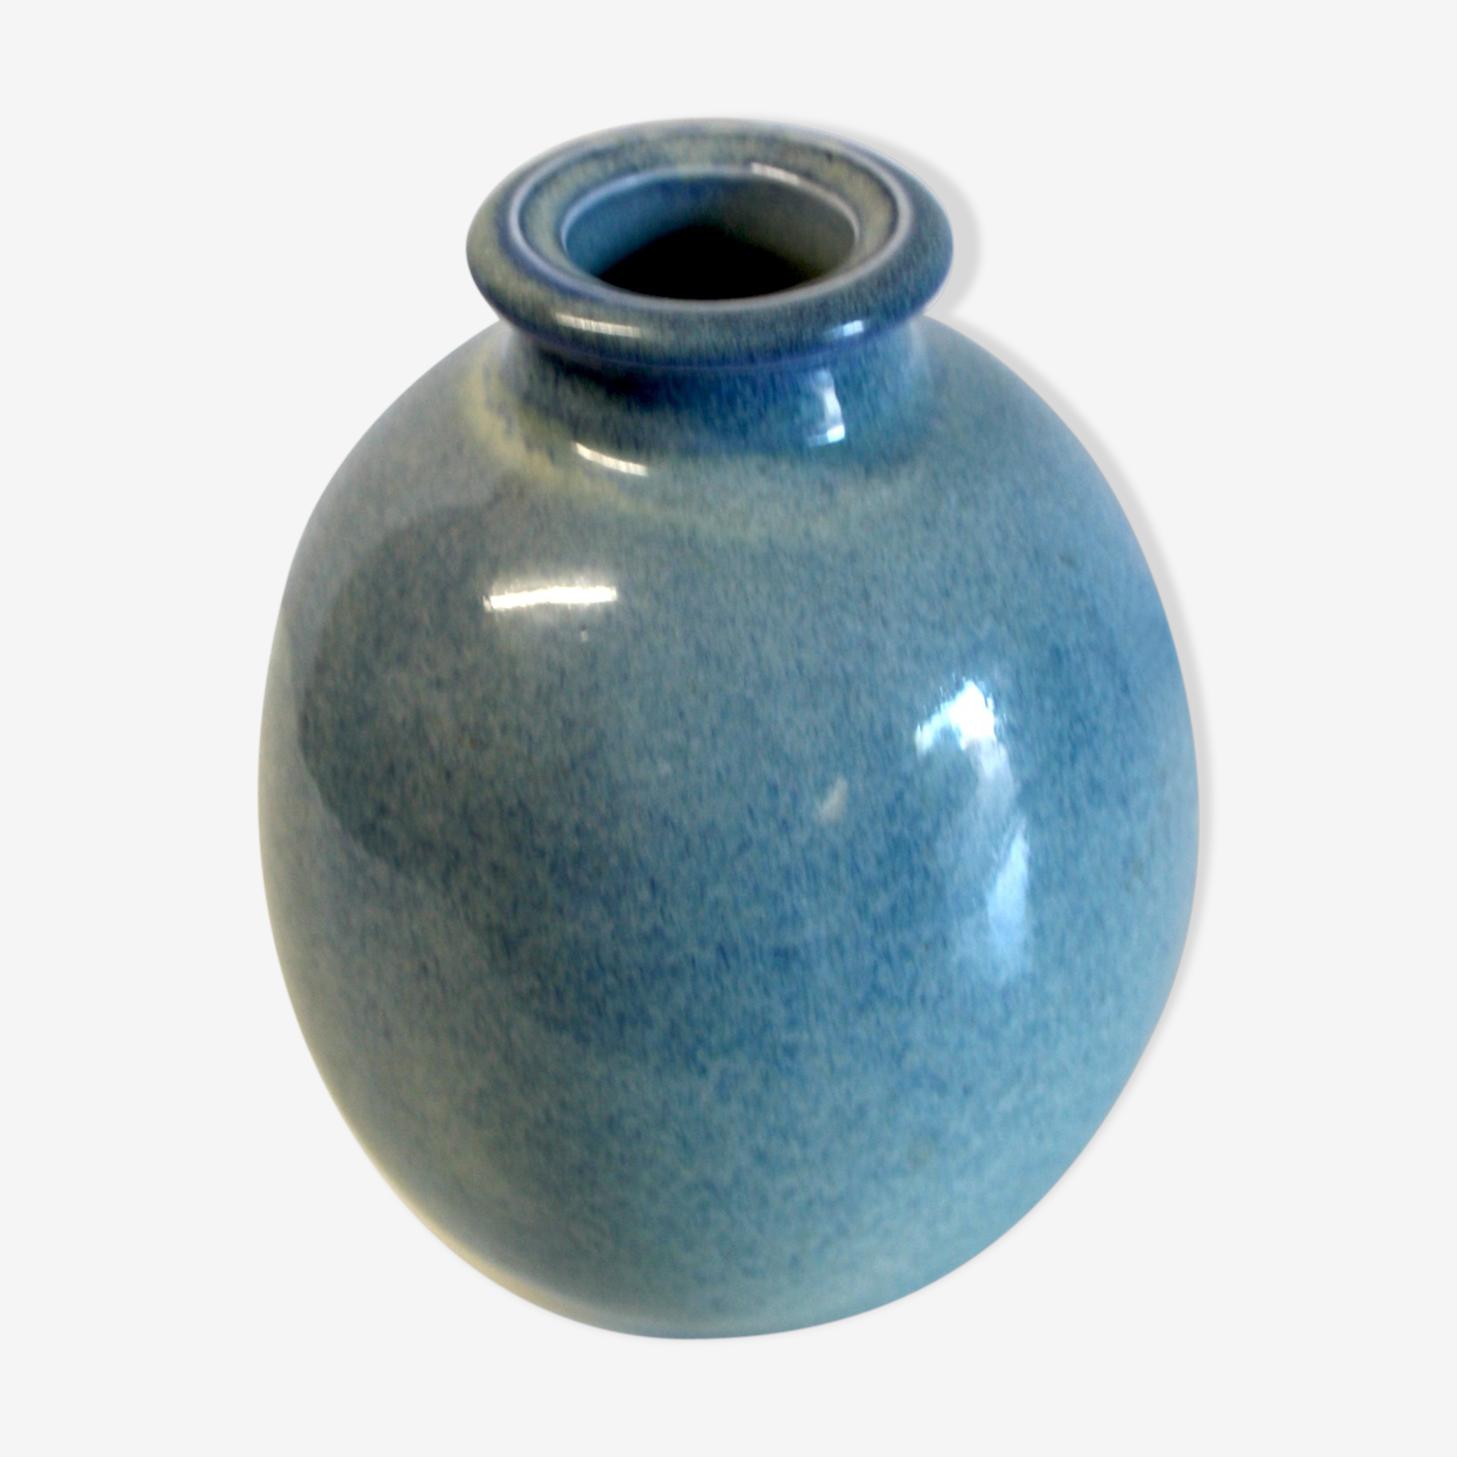 Boulle enameled ceramic vase